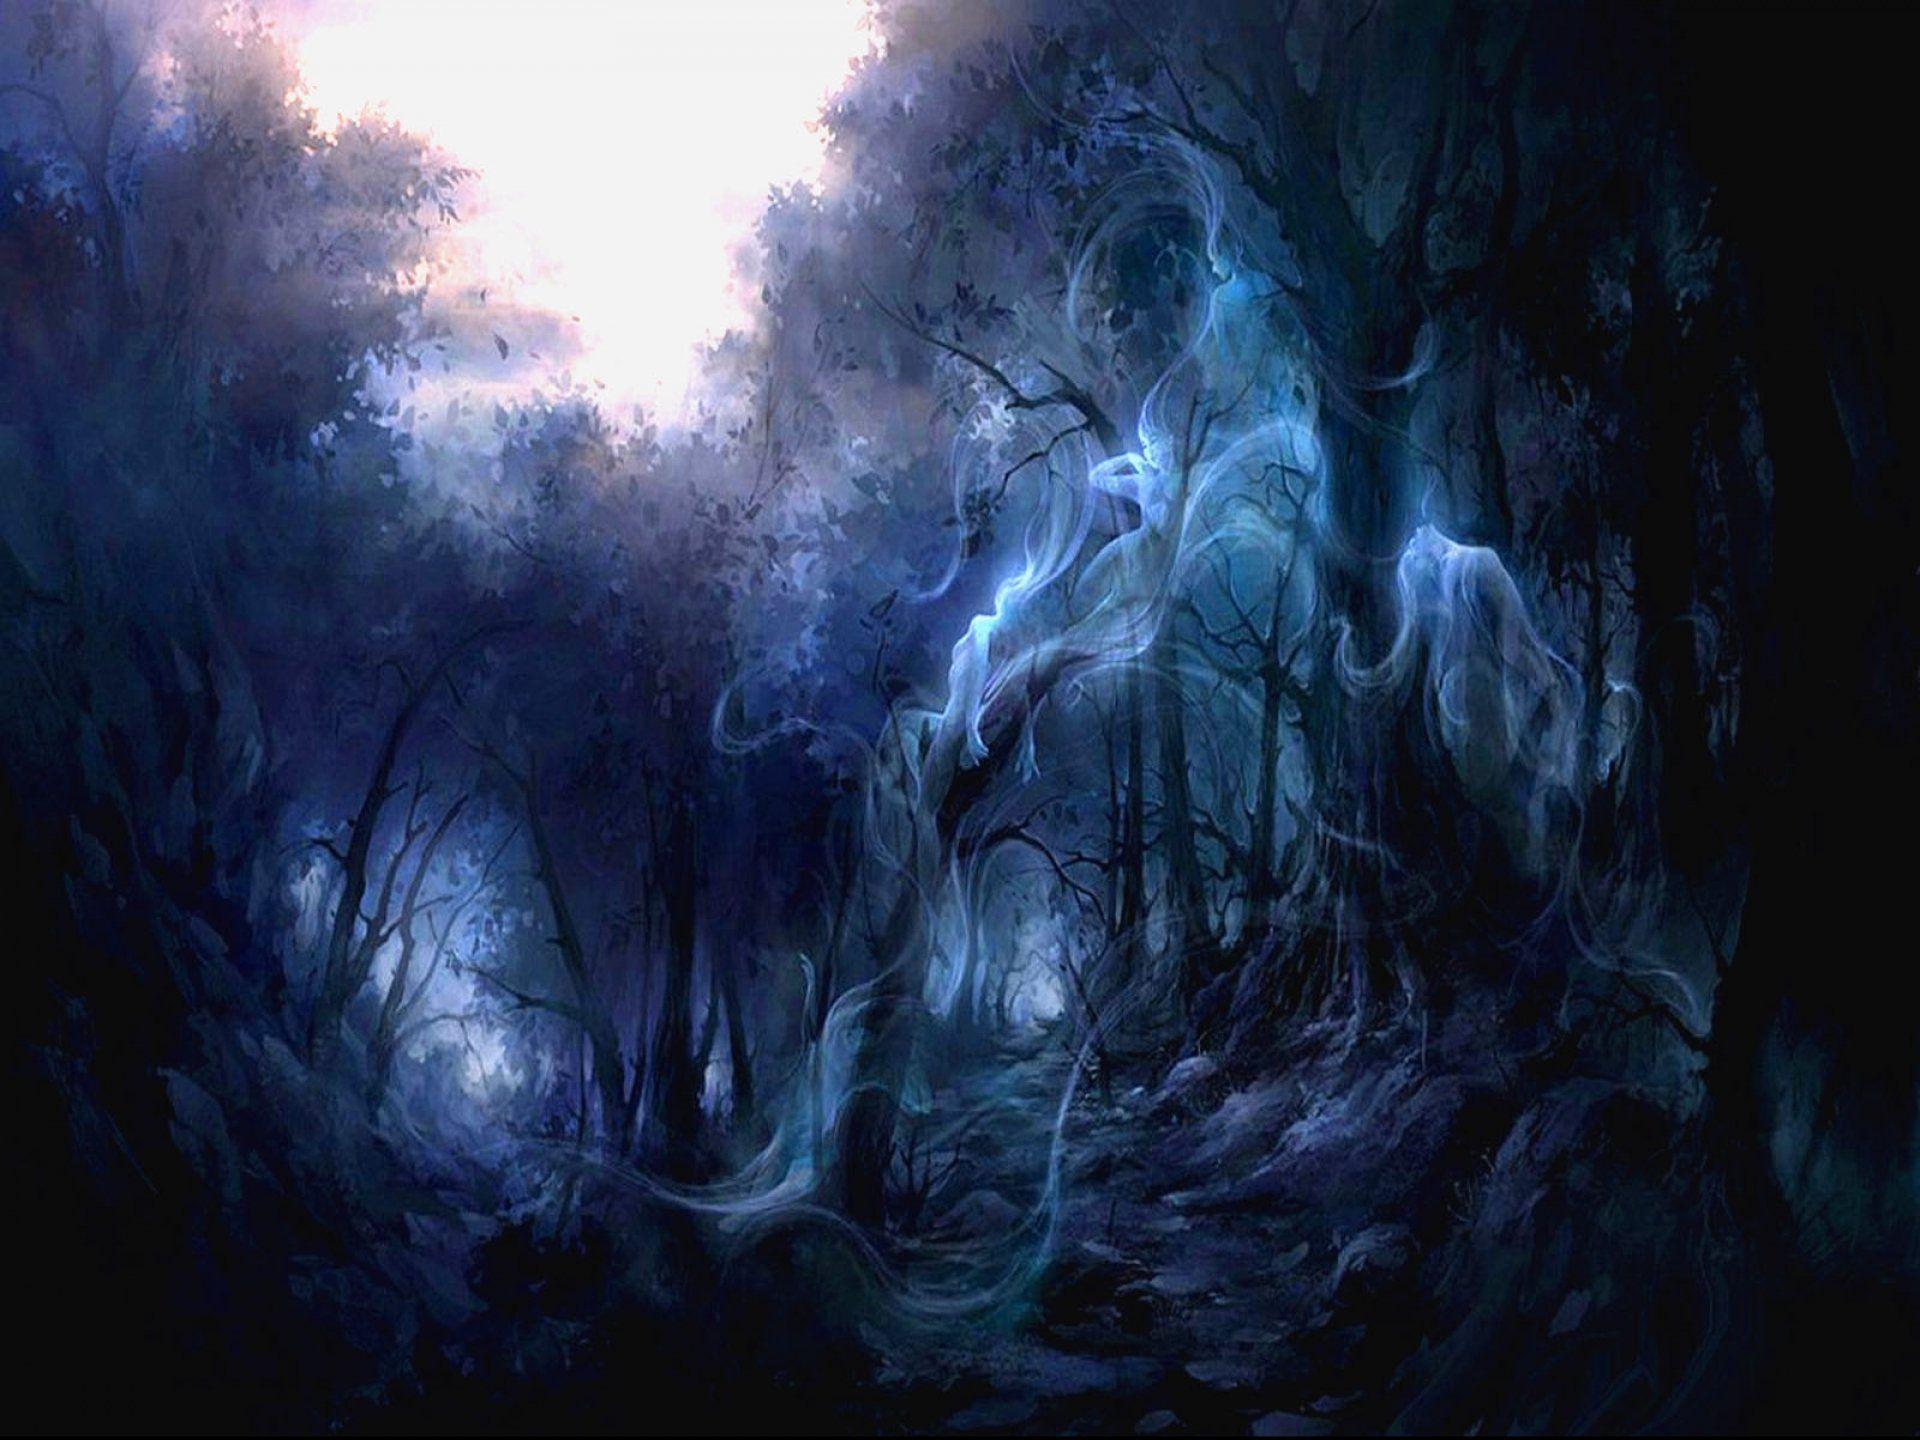 Smoke Spirit Fantasy Art #FantasyArt VistaLore daily pics of beauty